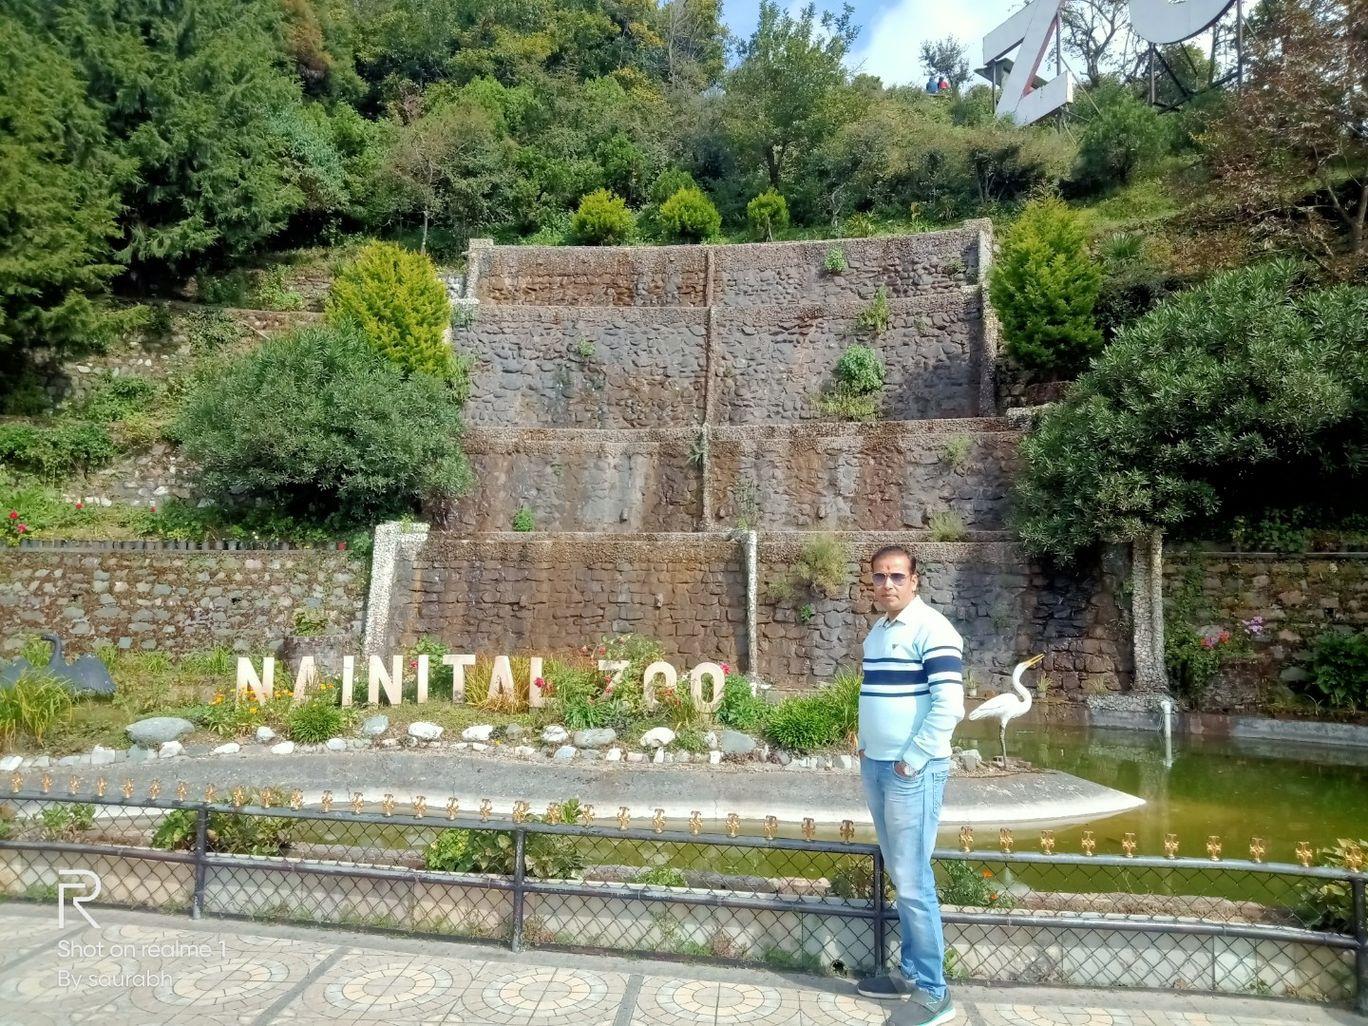 Photo of Nainital By saurabh sahai